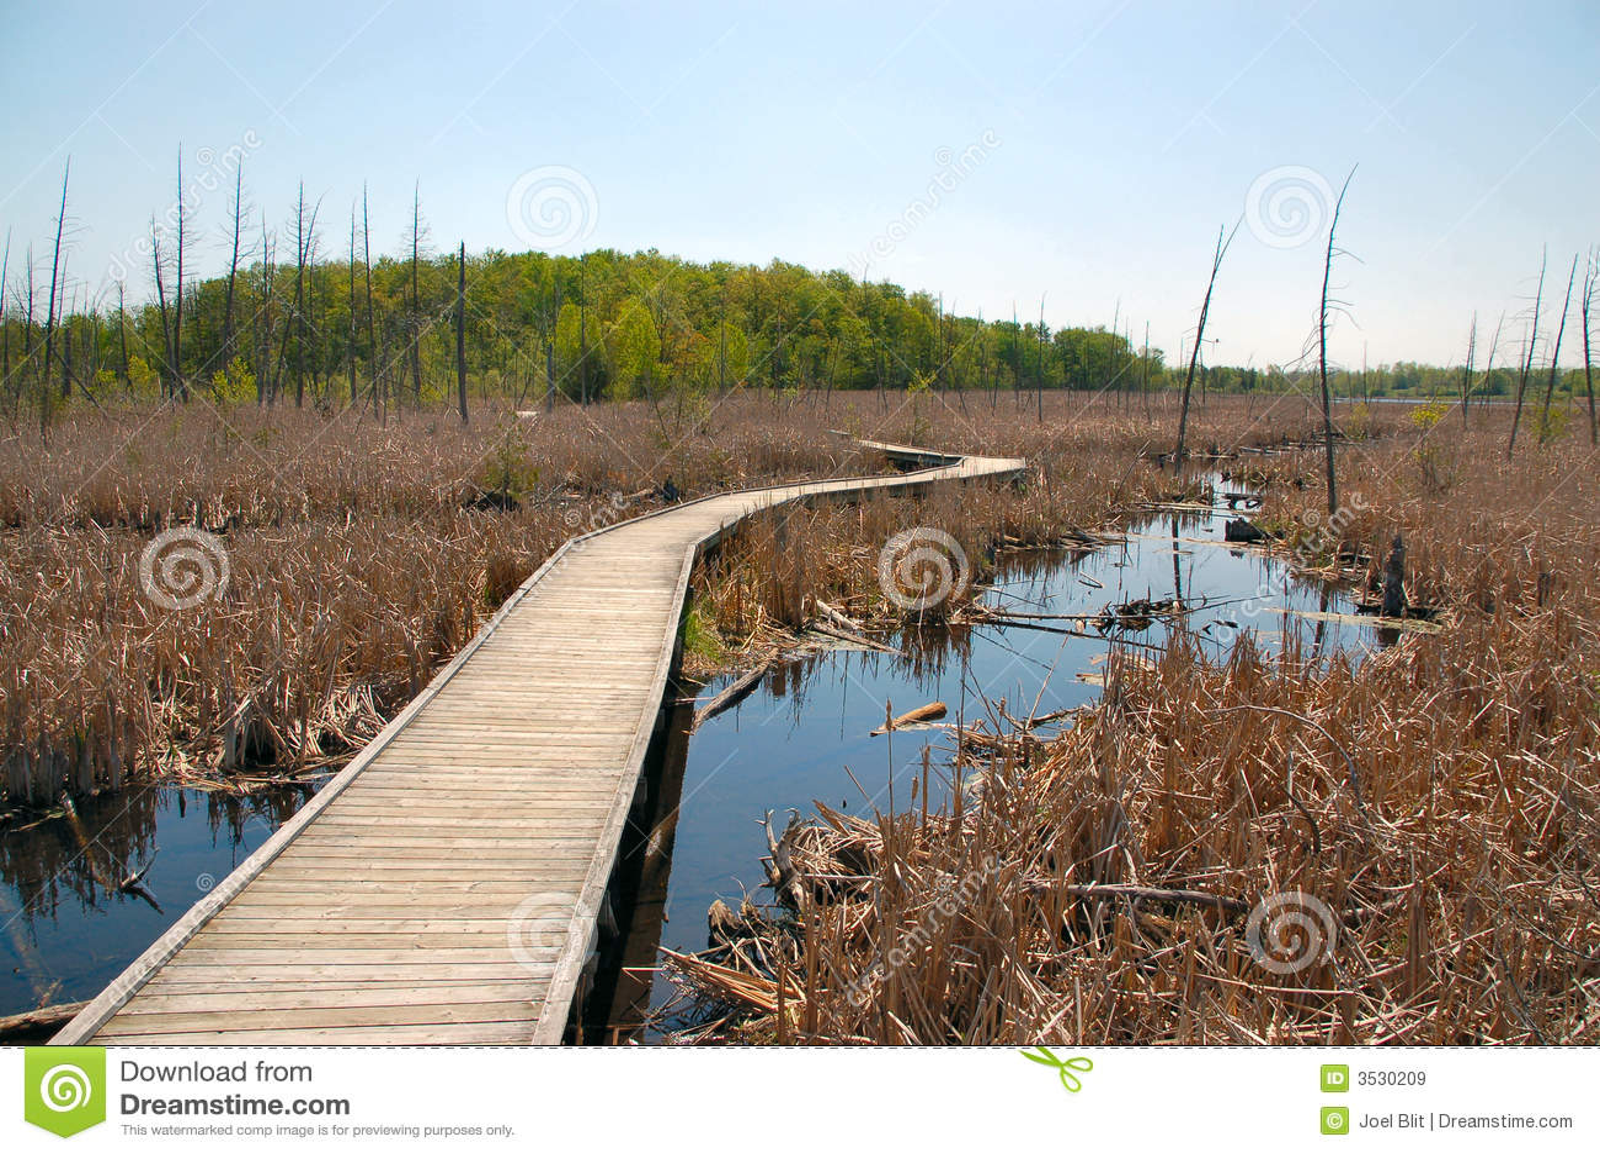 Boardwalk över våtmarker